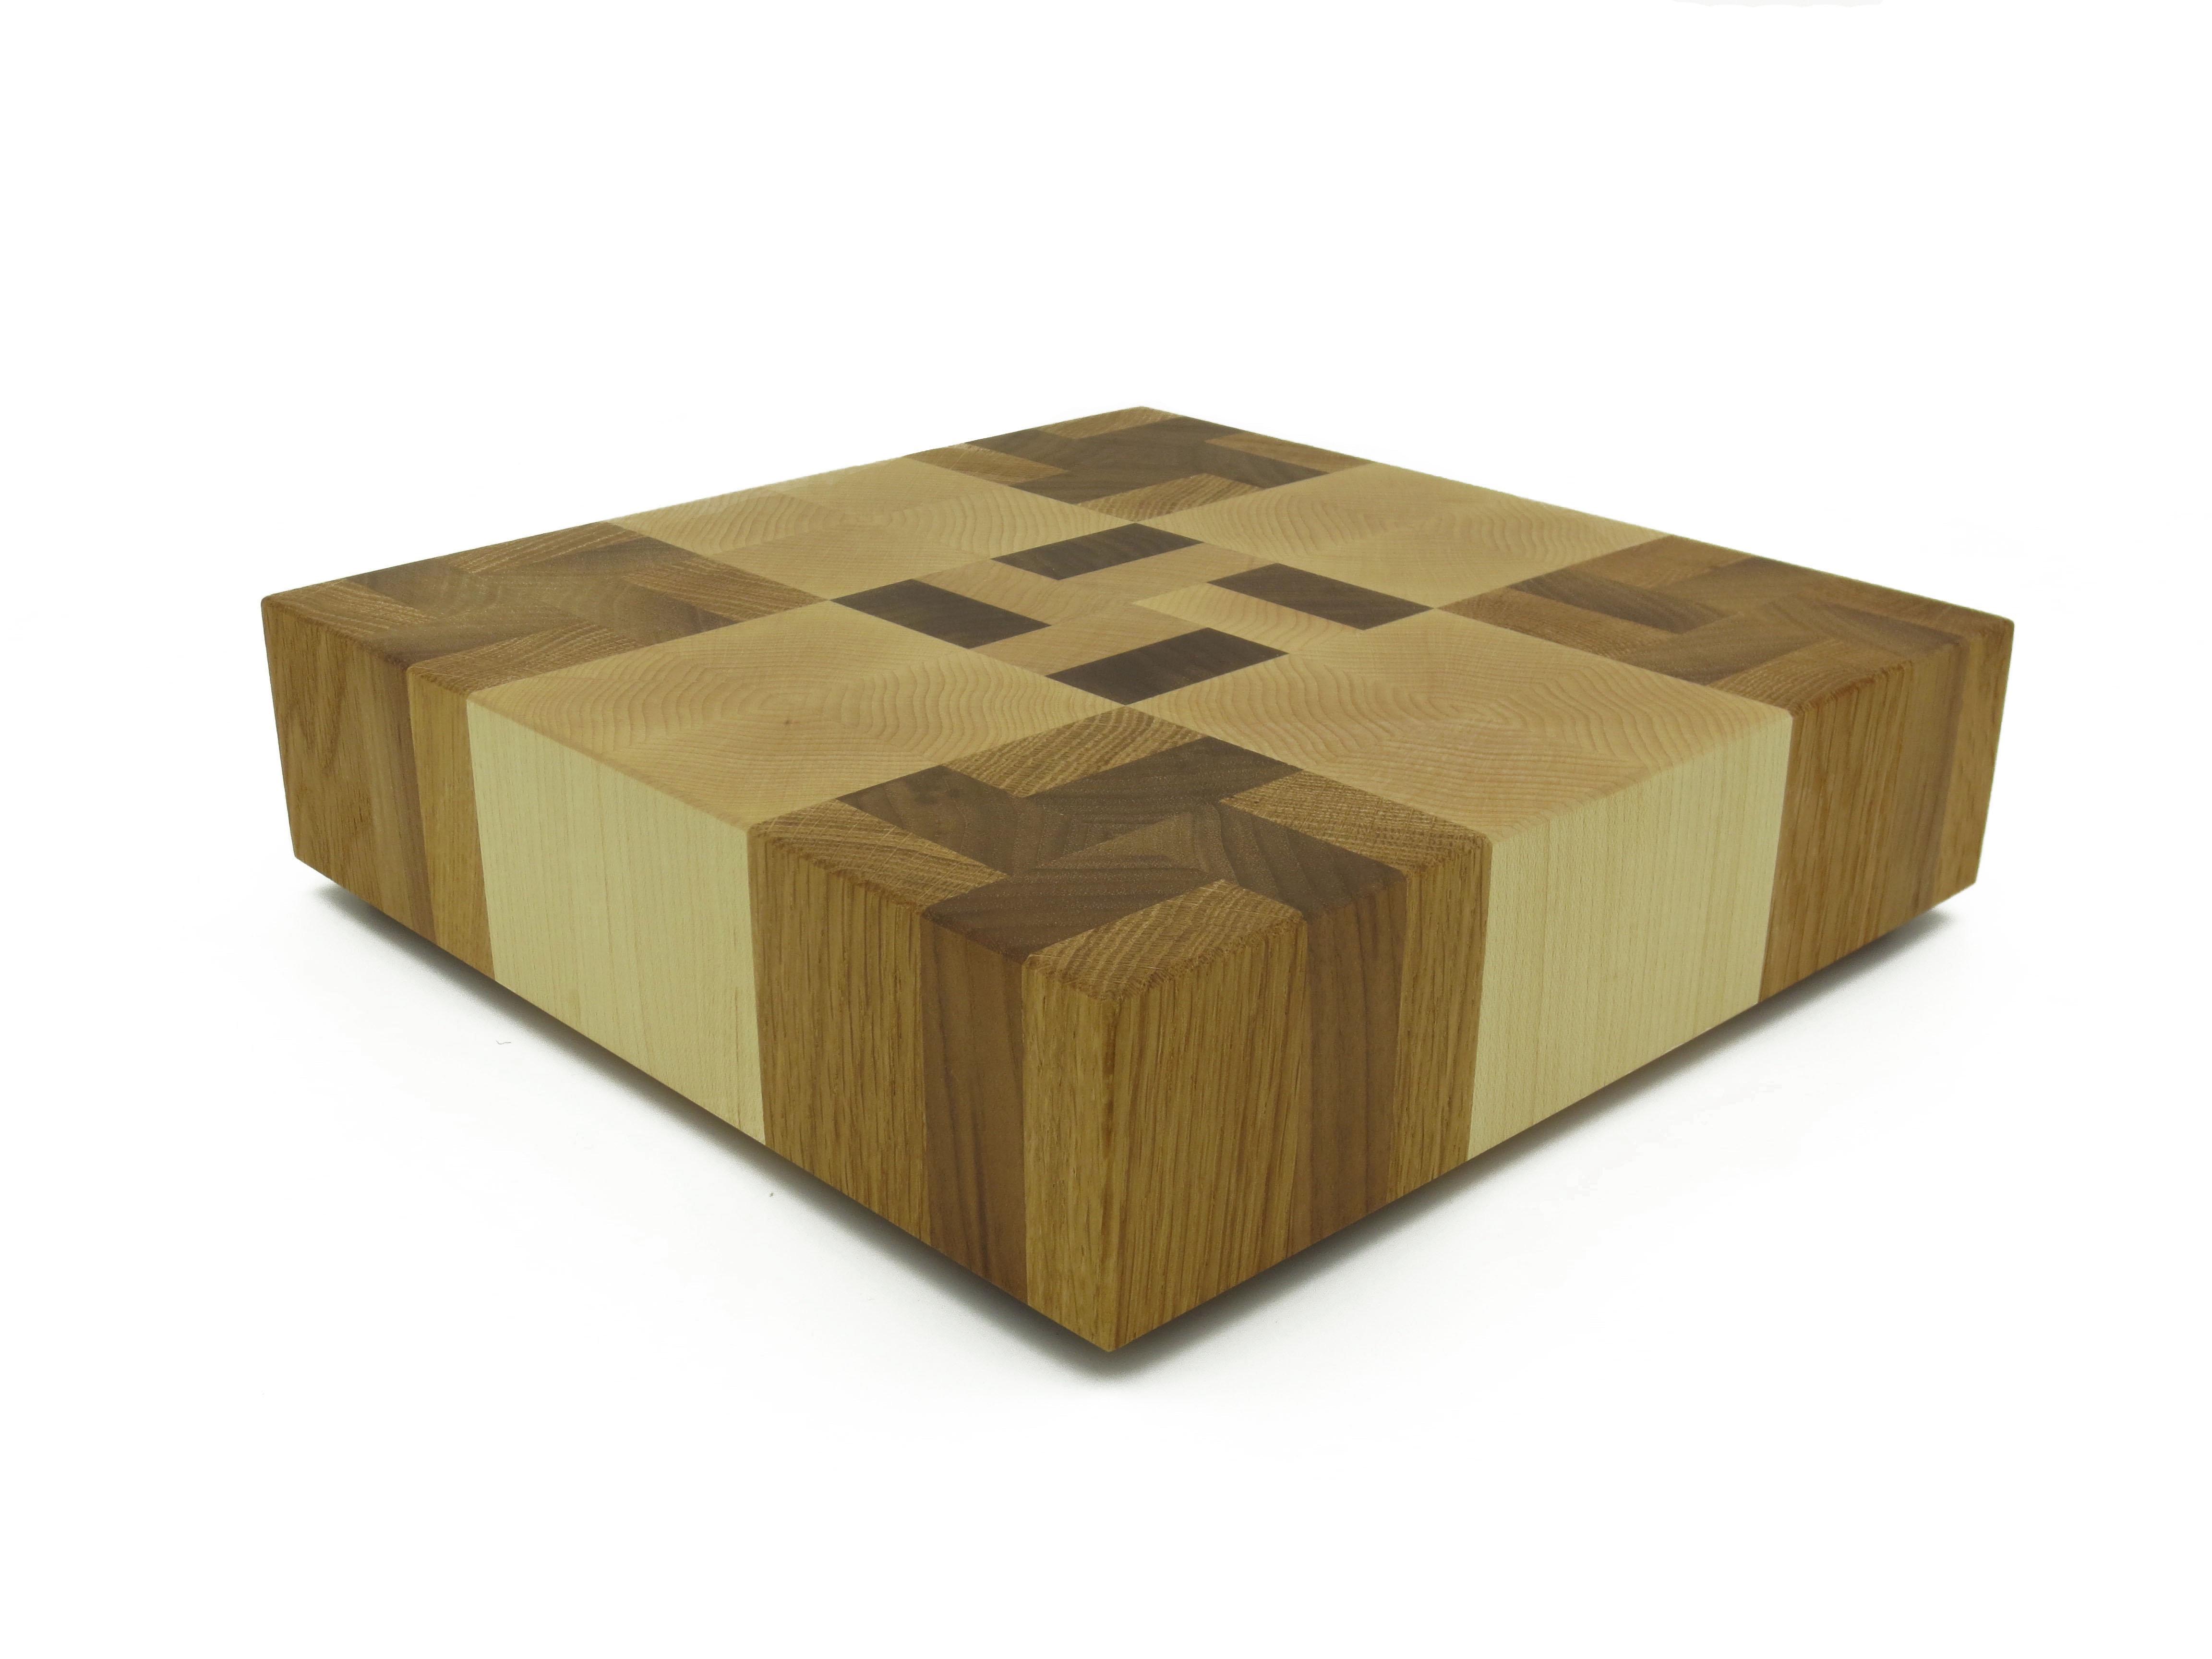 End Grain Coffee Table.9 Square End Grain Cutting Board